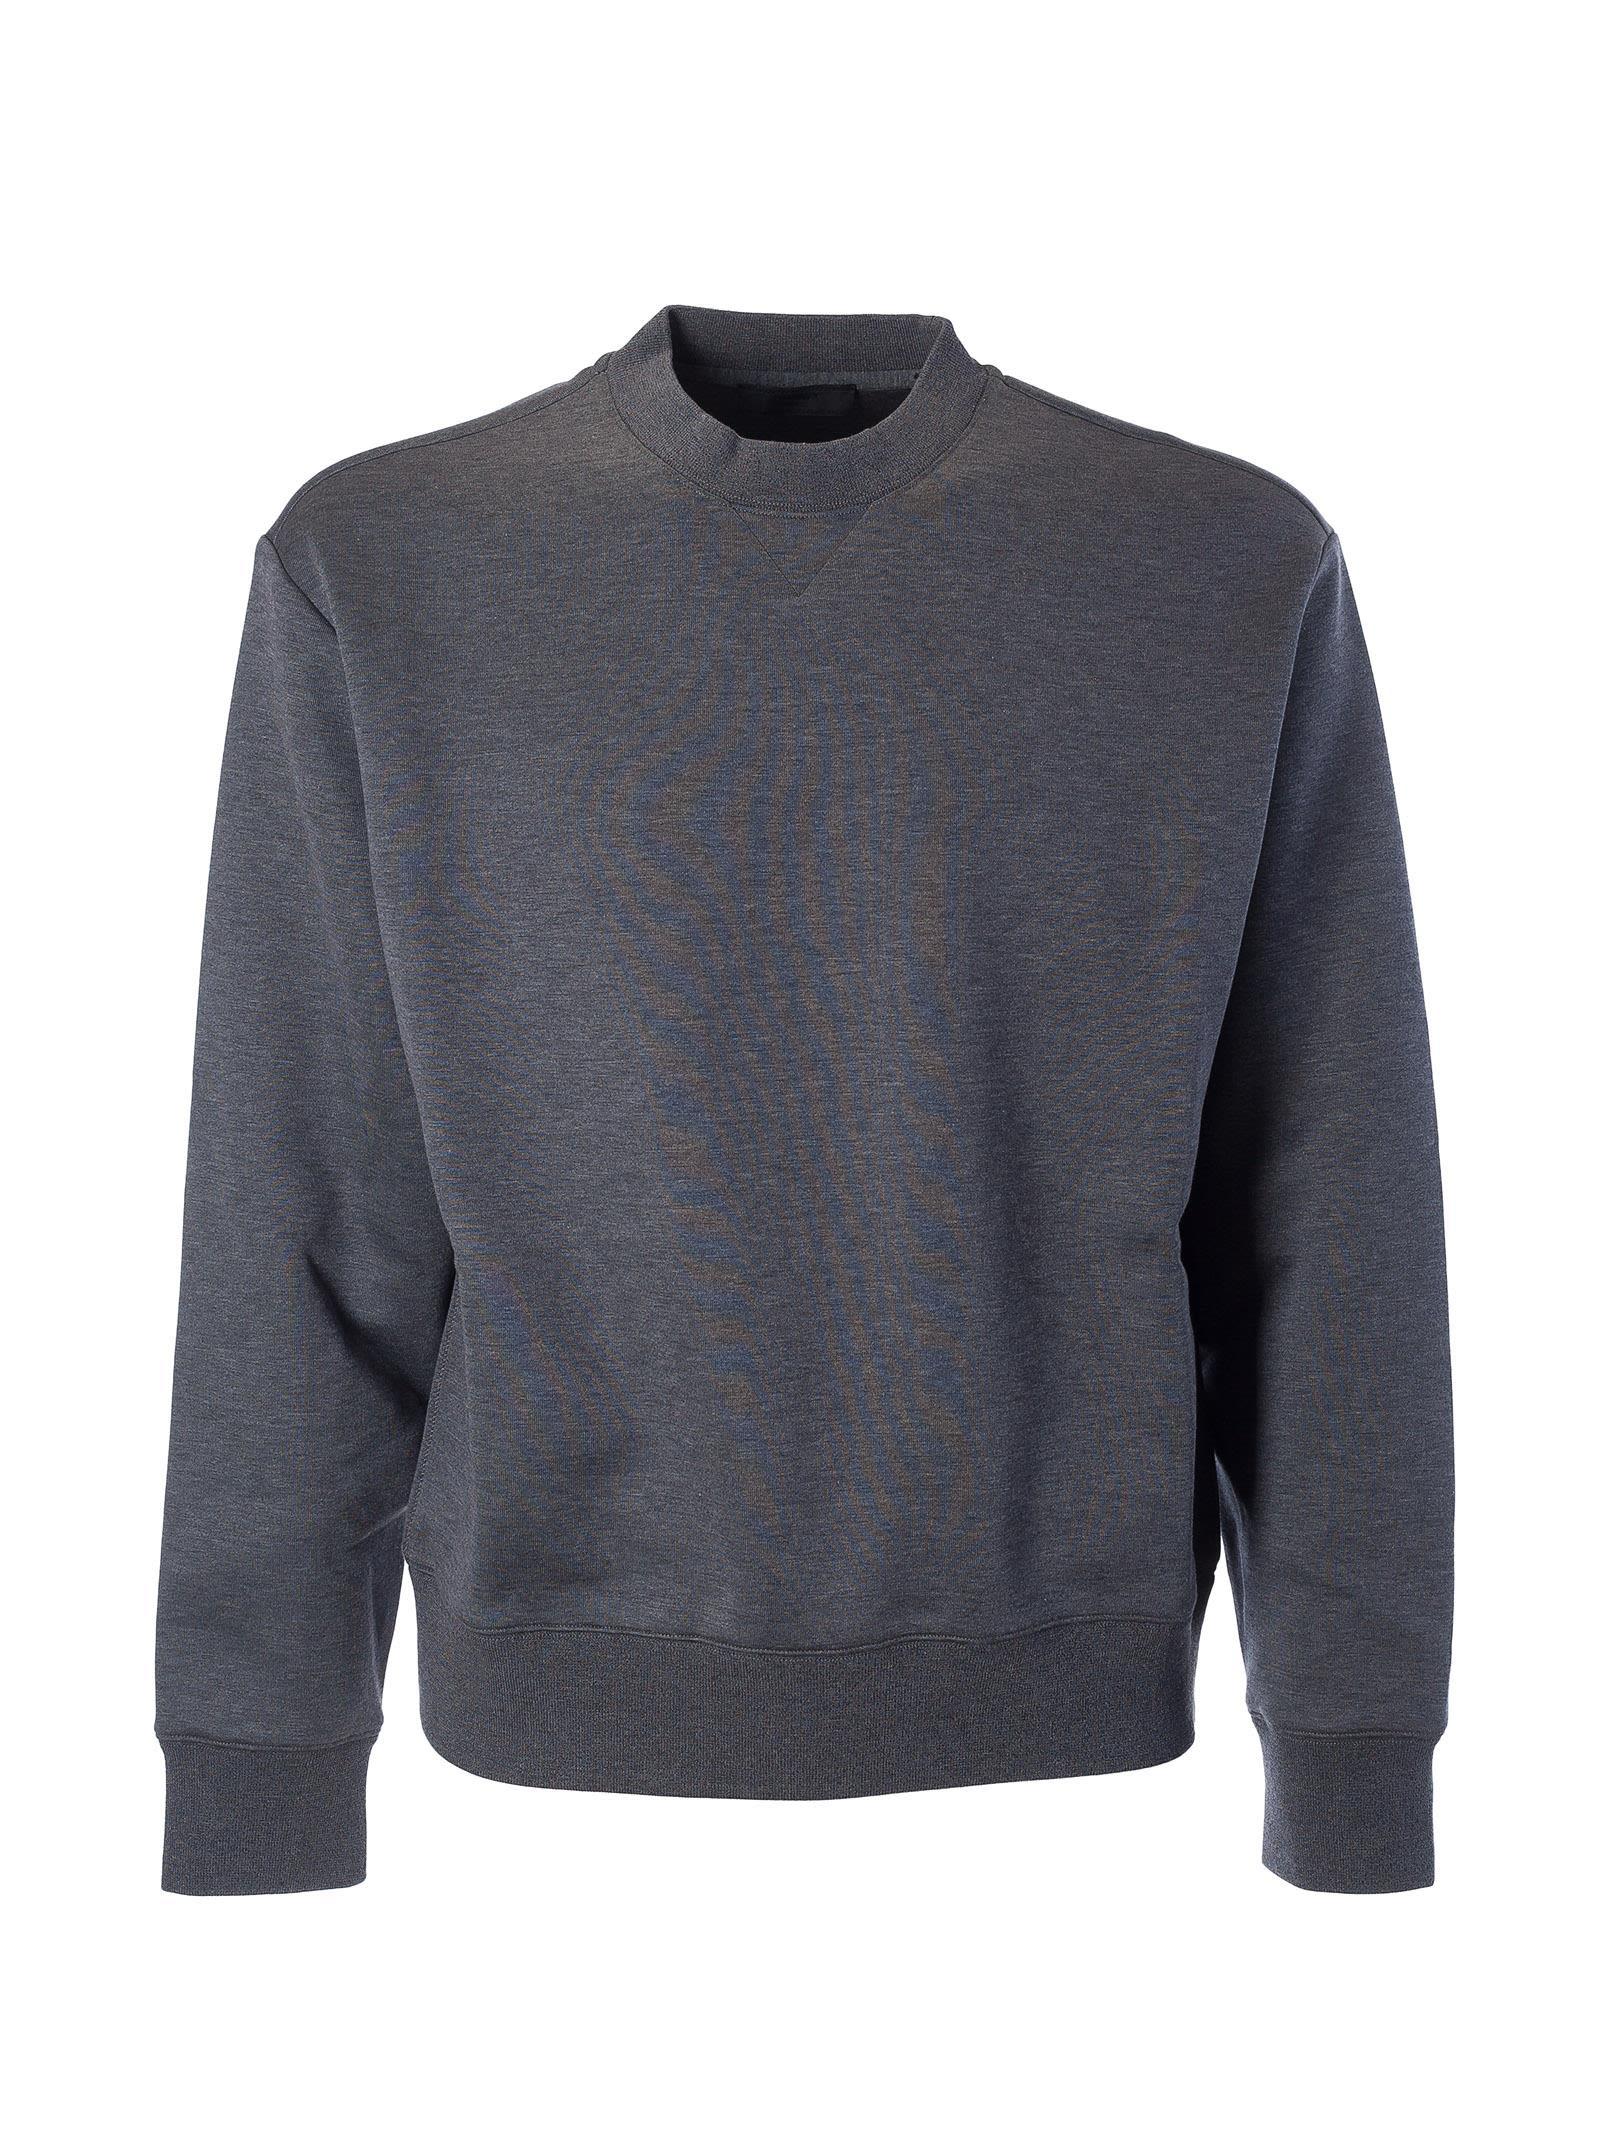 Prada Stretch Sweatshirt